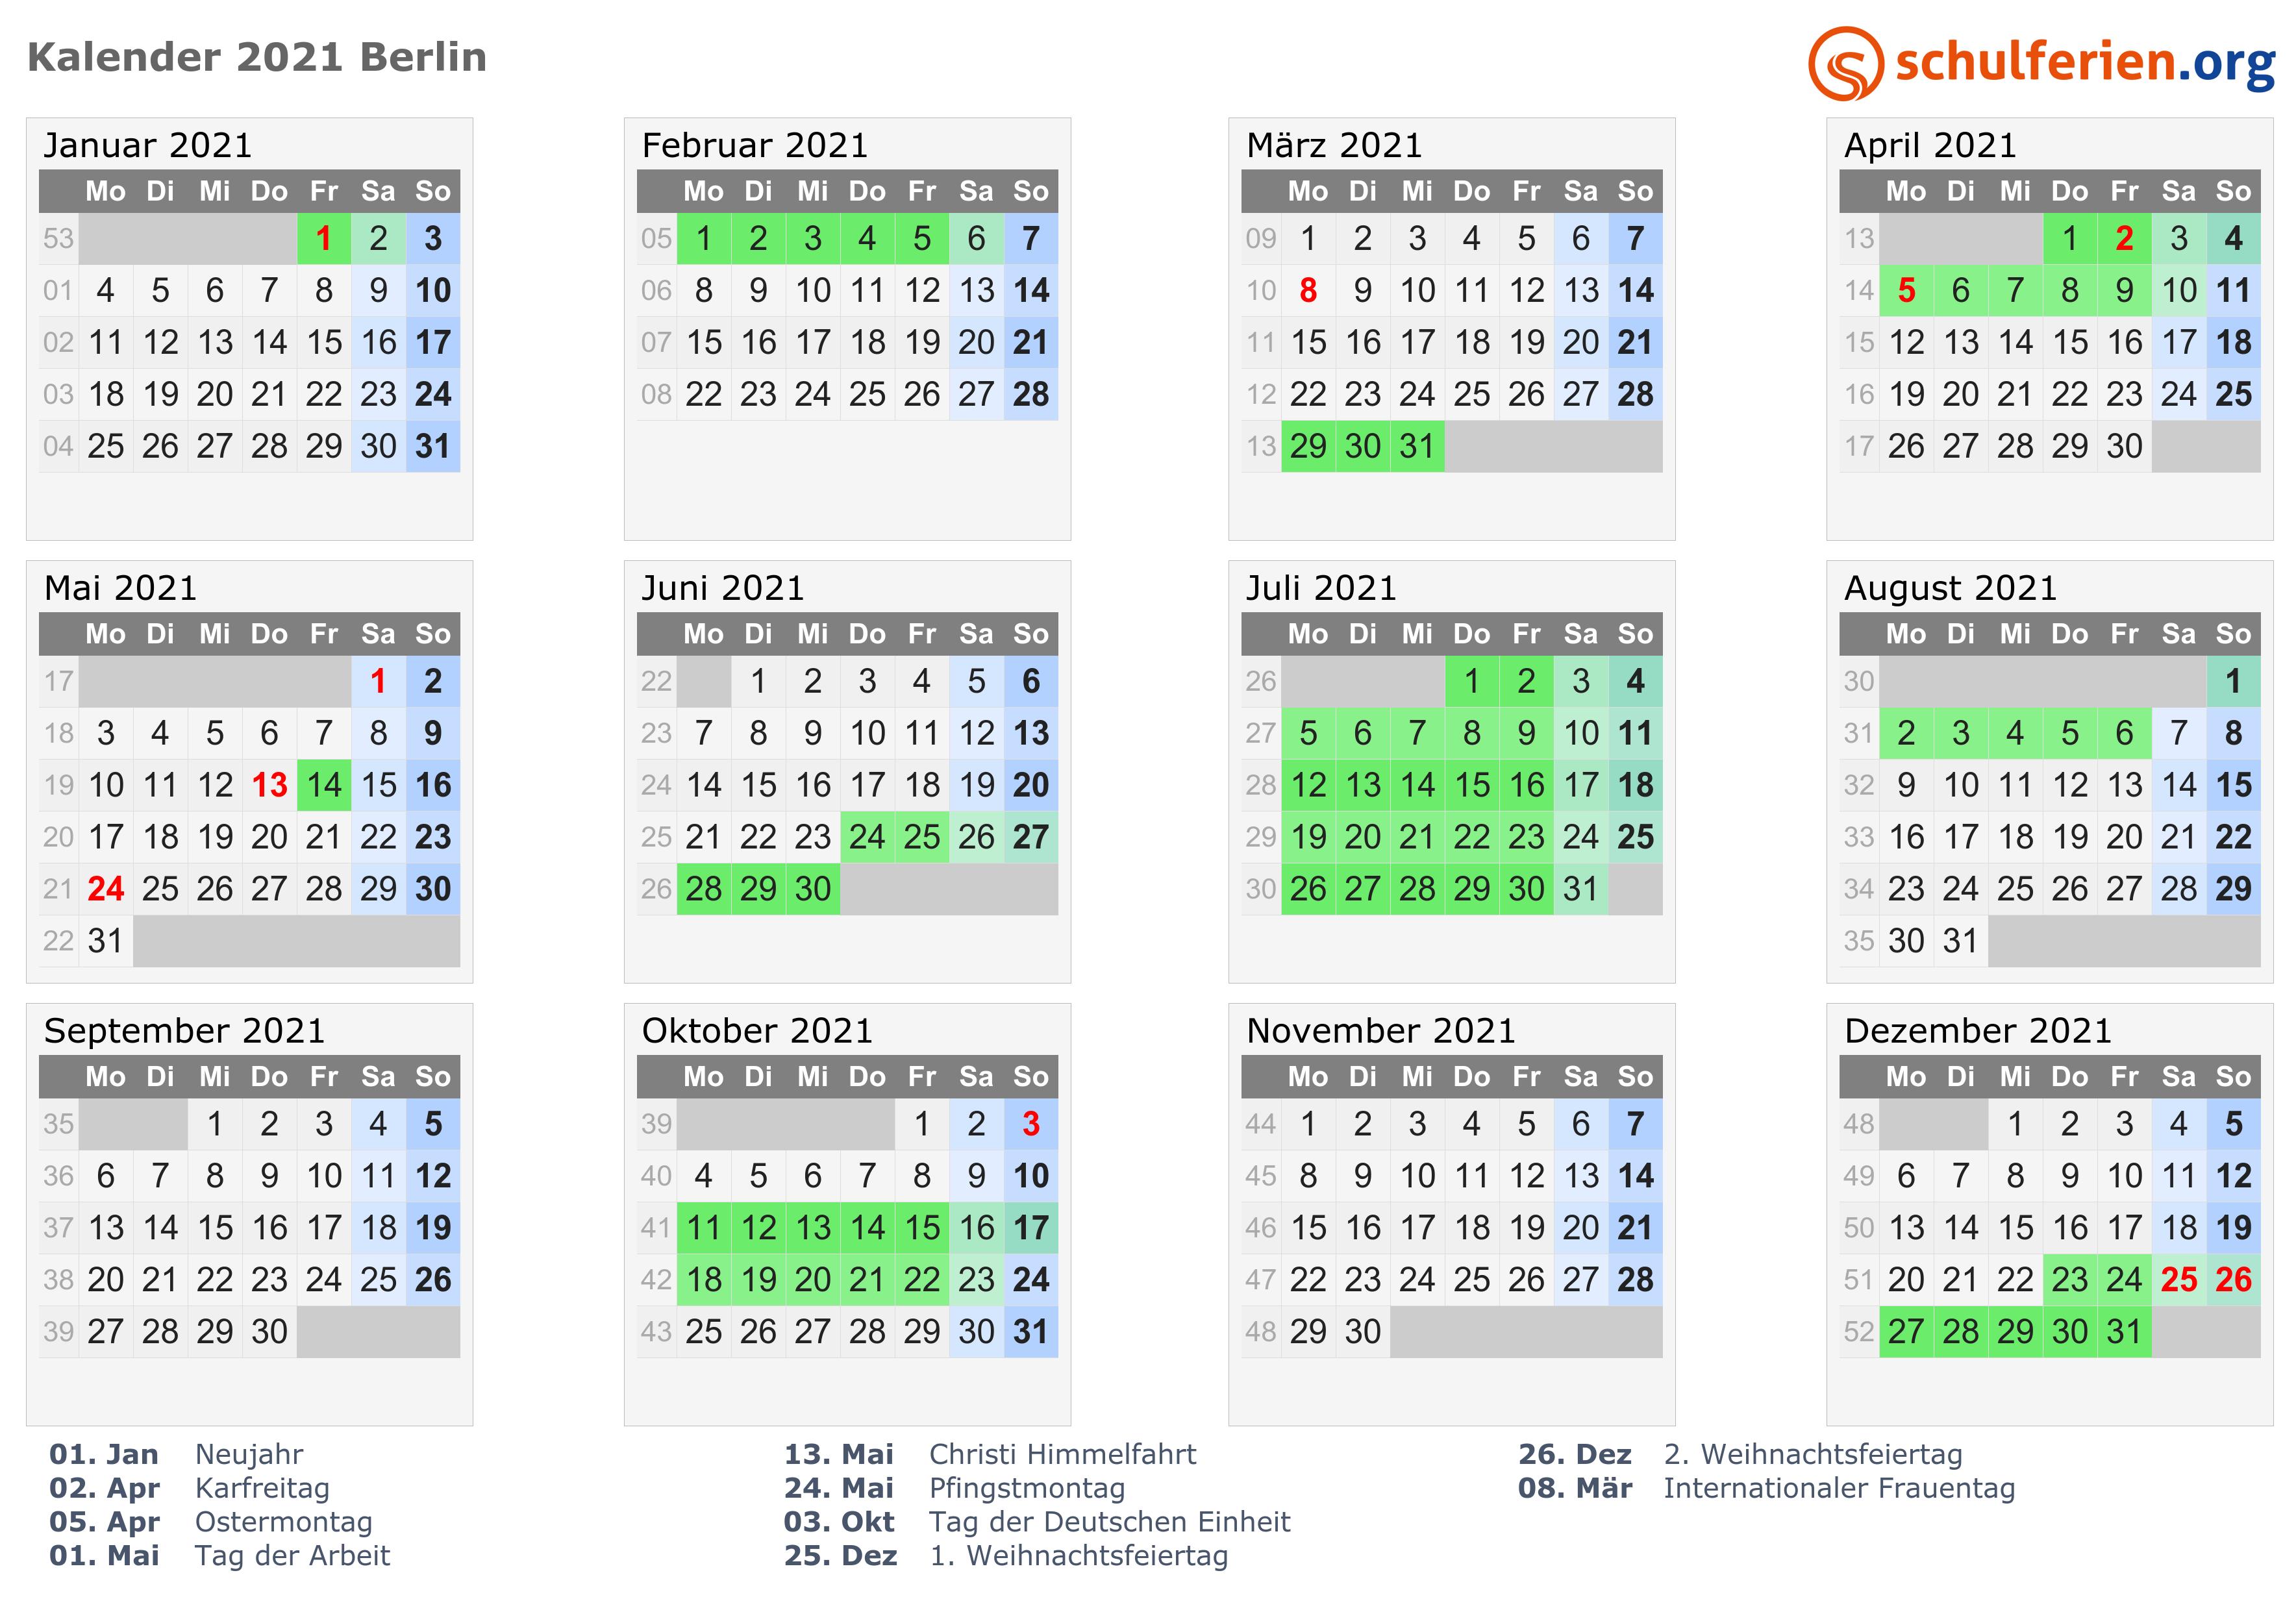 Schulferien Berlin 2021 Kalender